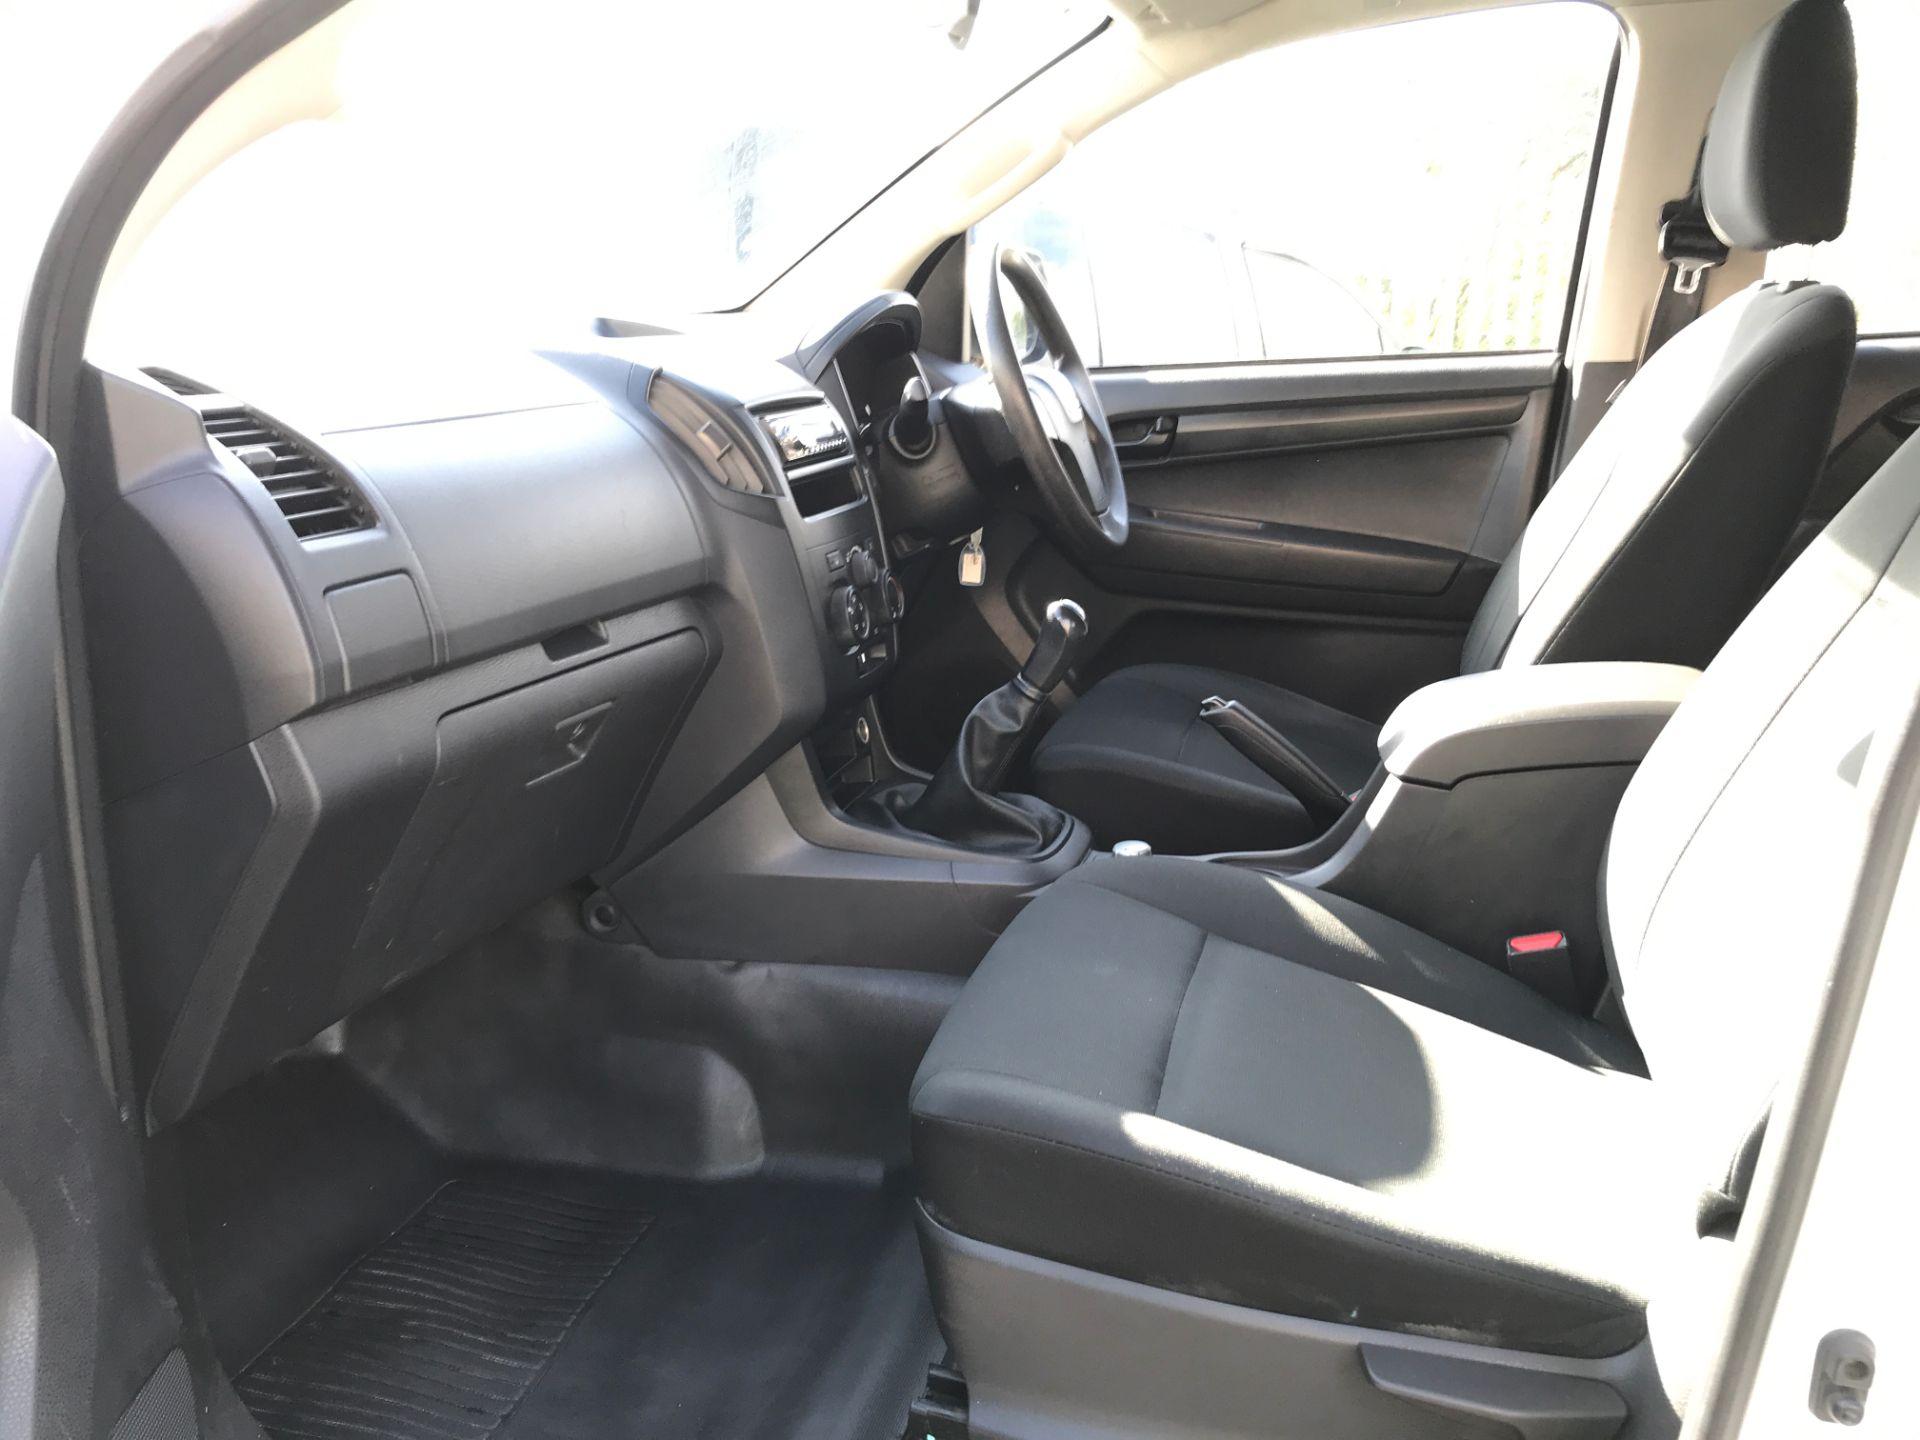 2015 Isuzu D-Max DOUBLE CAB 4X4 2.5TD 163PS EURO 5, AIR CON (YB65DJF) Image 12